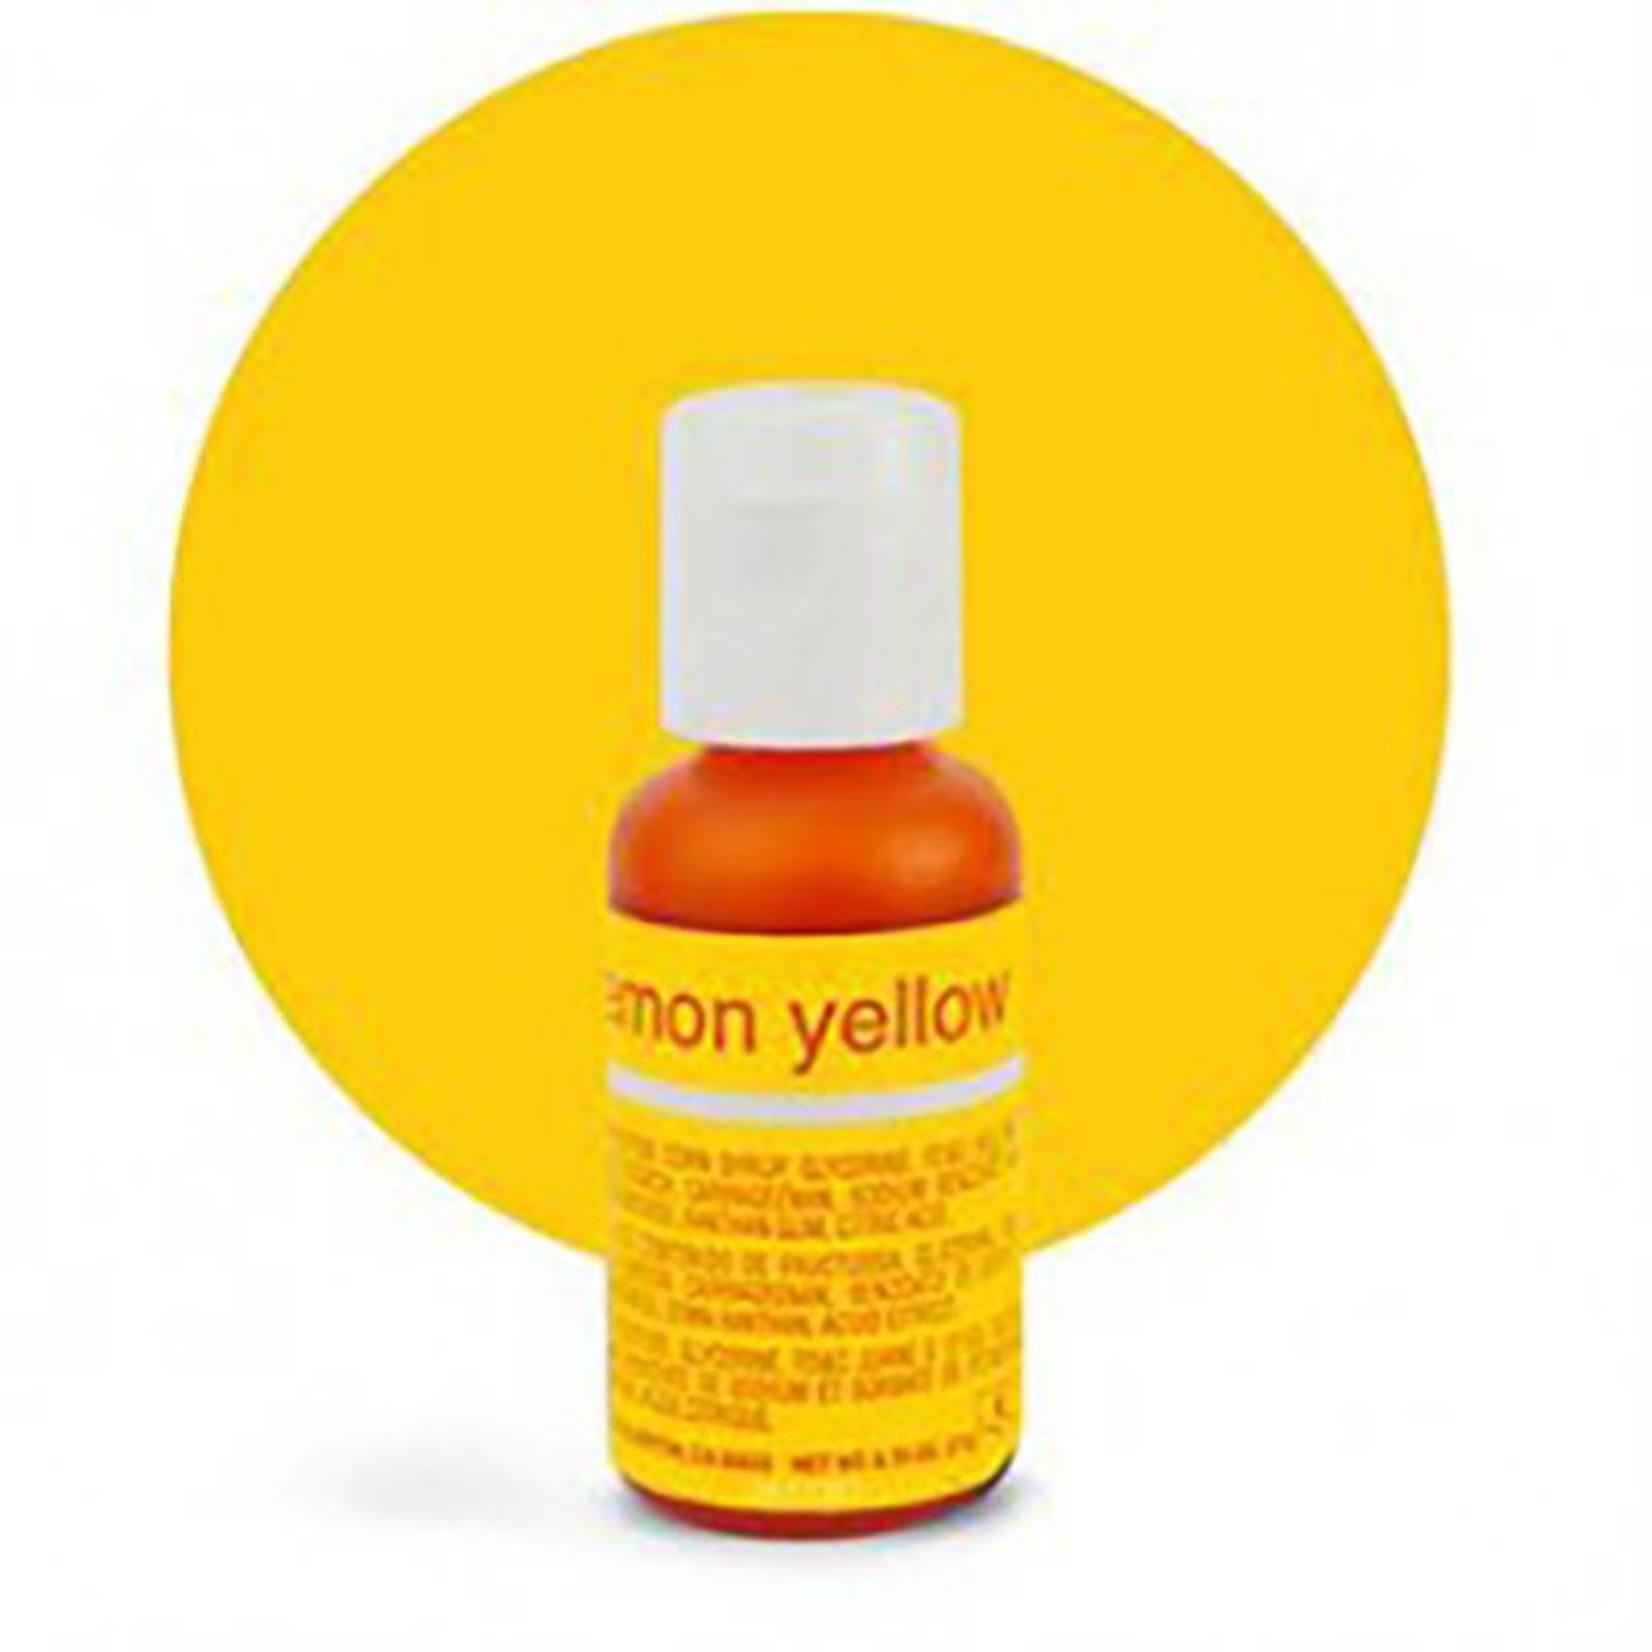 Chefmaster Chefmaster - Lemon Yellow Gel food color - 0.70oz